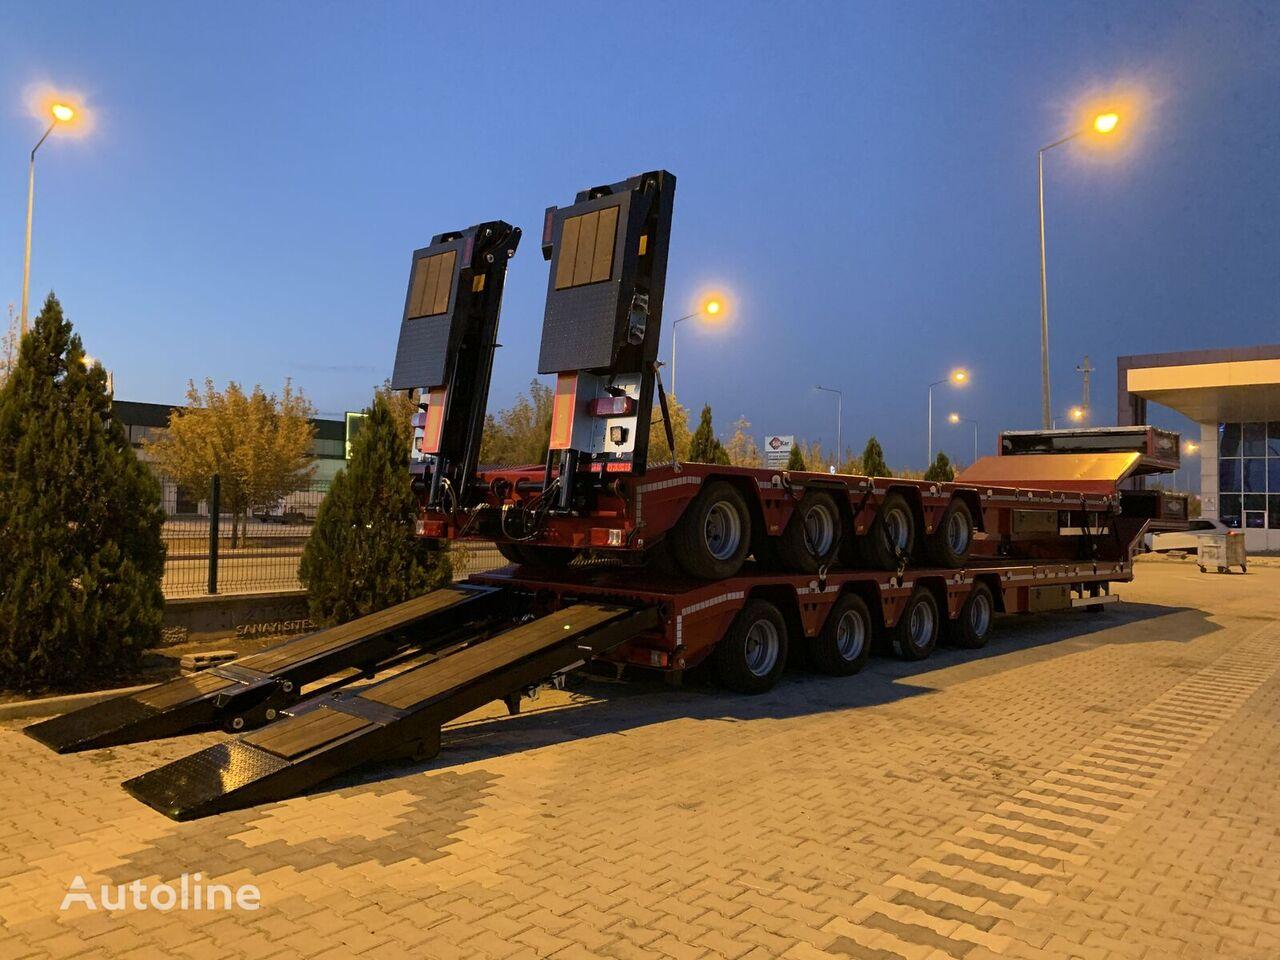 new GVN TRAILER GVN TRAILER 3 AXLE LOWBED 2021 MODEL ( MANUFACTURER) low bed semi-trailer